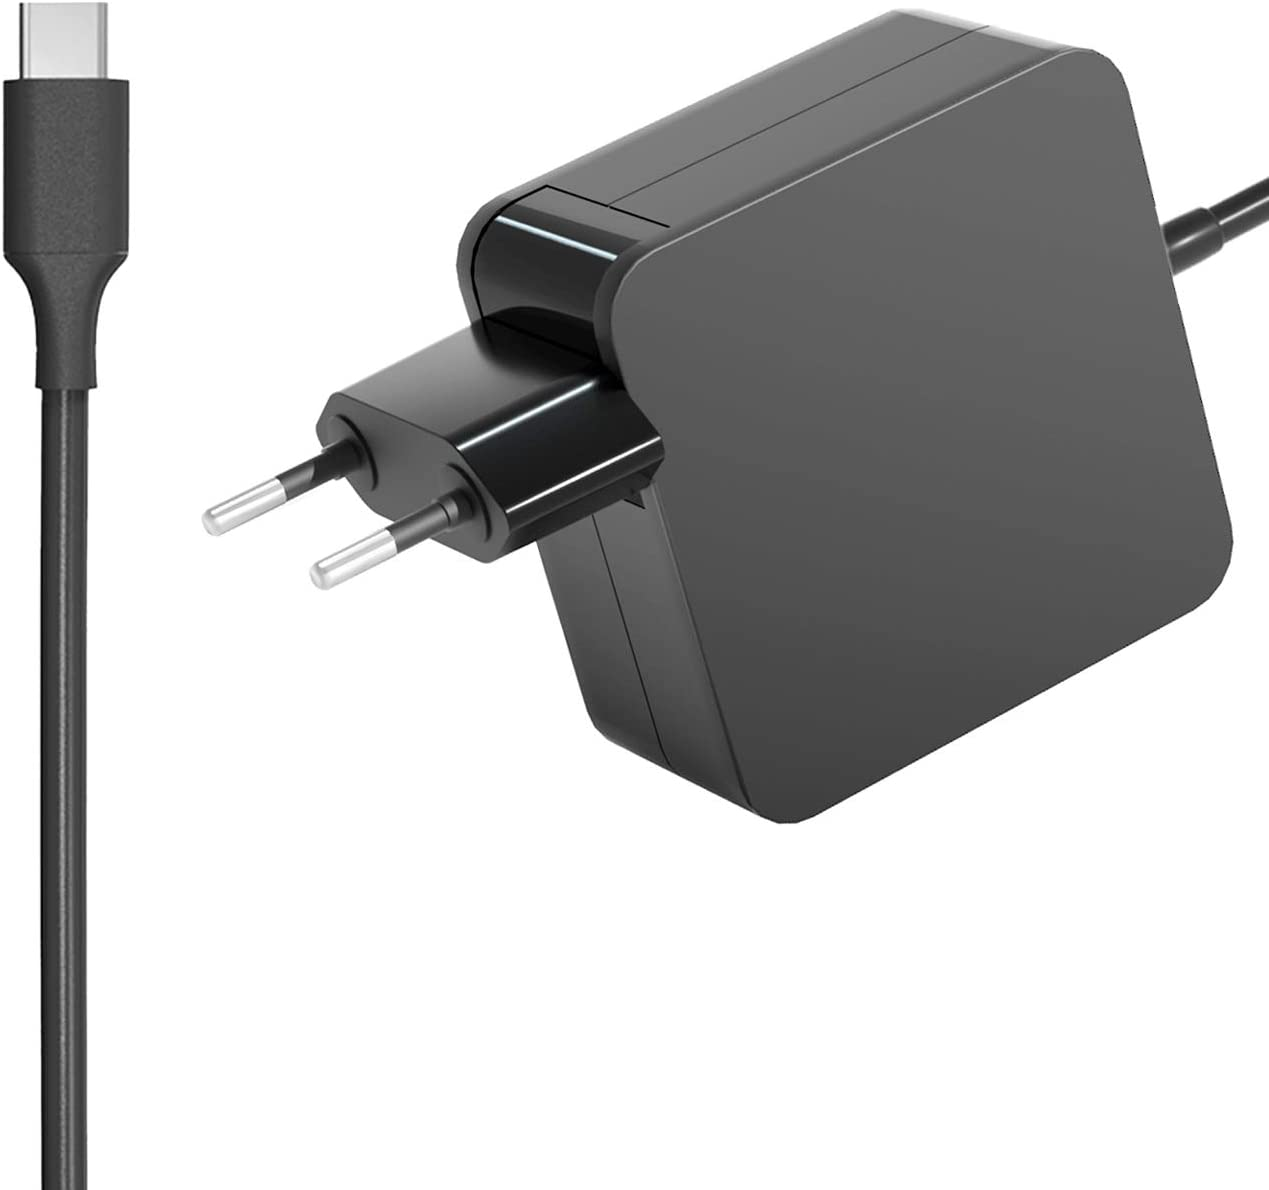 Milipow - Cargador de 65 W tipo C para ordenador portátil HP Chromebook 13 G1; Chromebook x360 11 G1 EE; Elite x2 1012 G1 Tablet X2 210 G2 PC desmontable